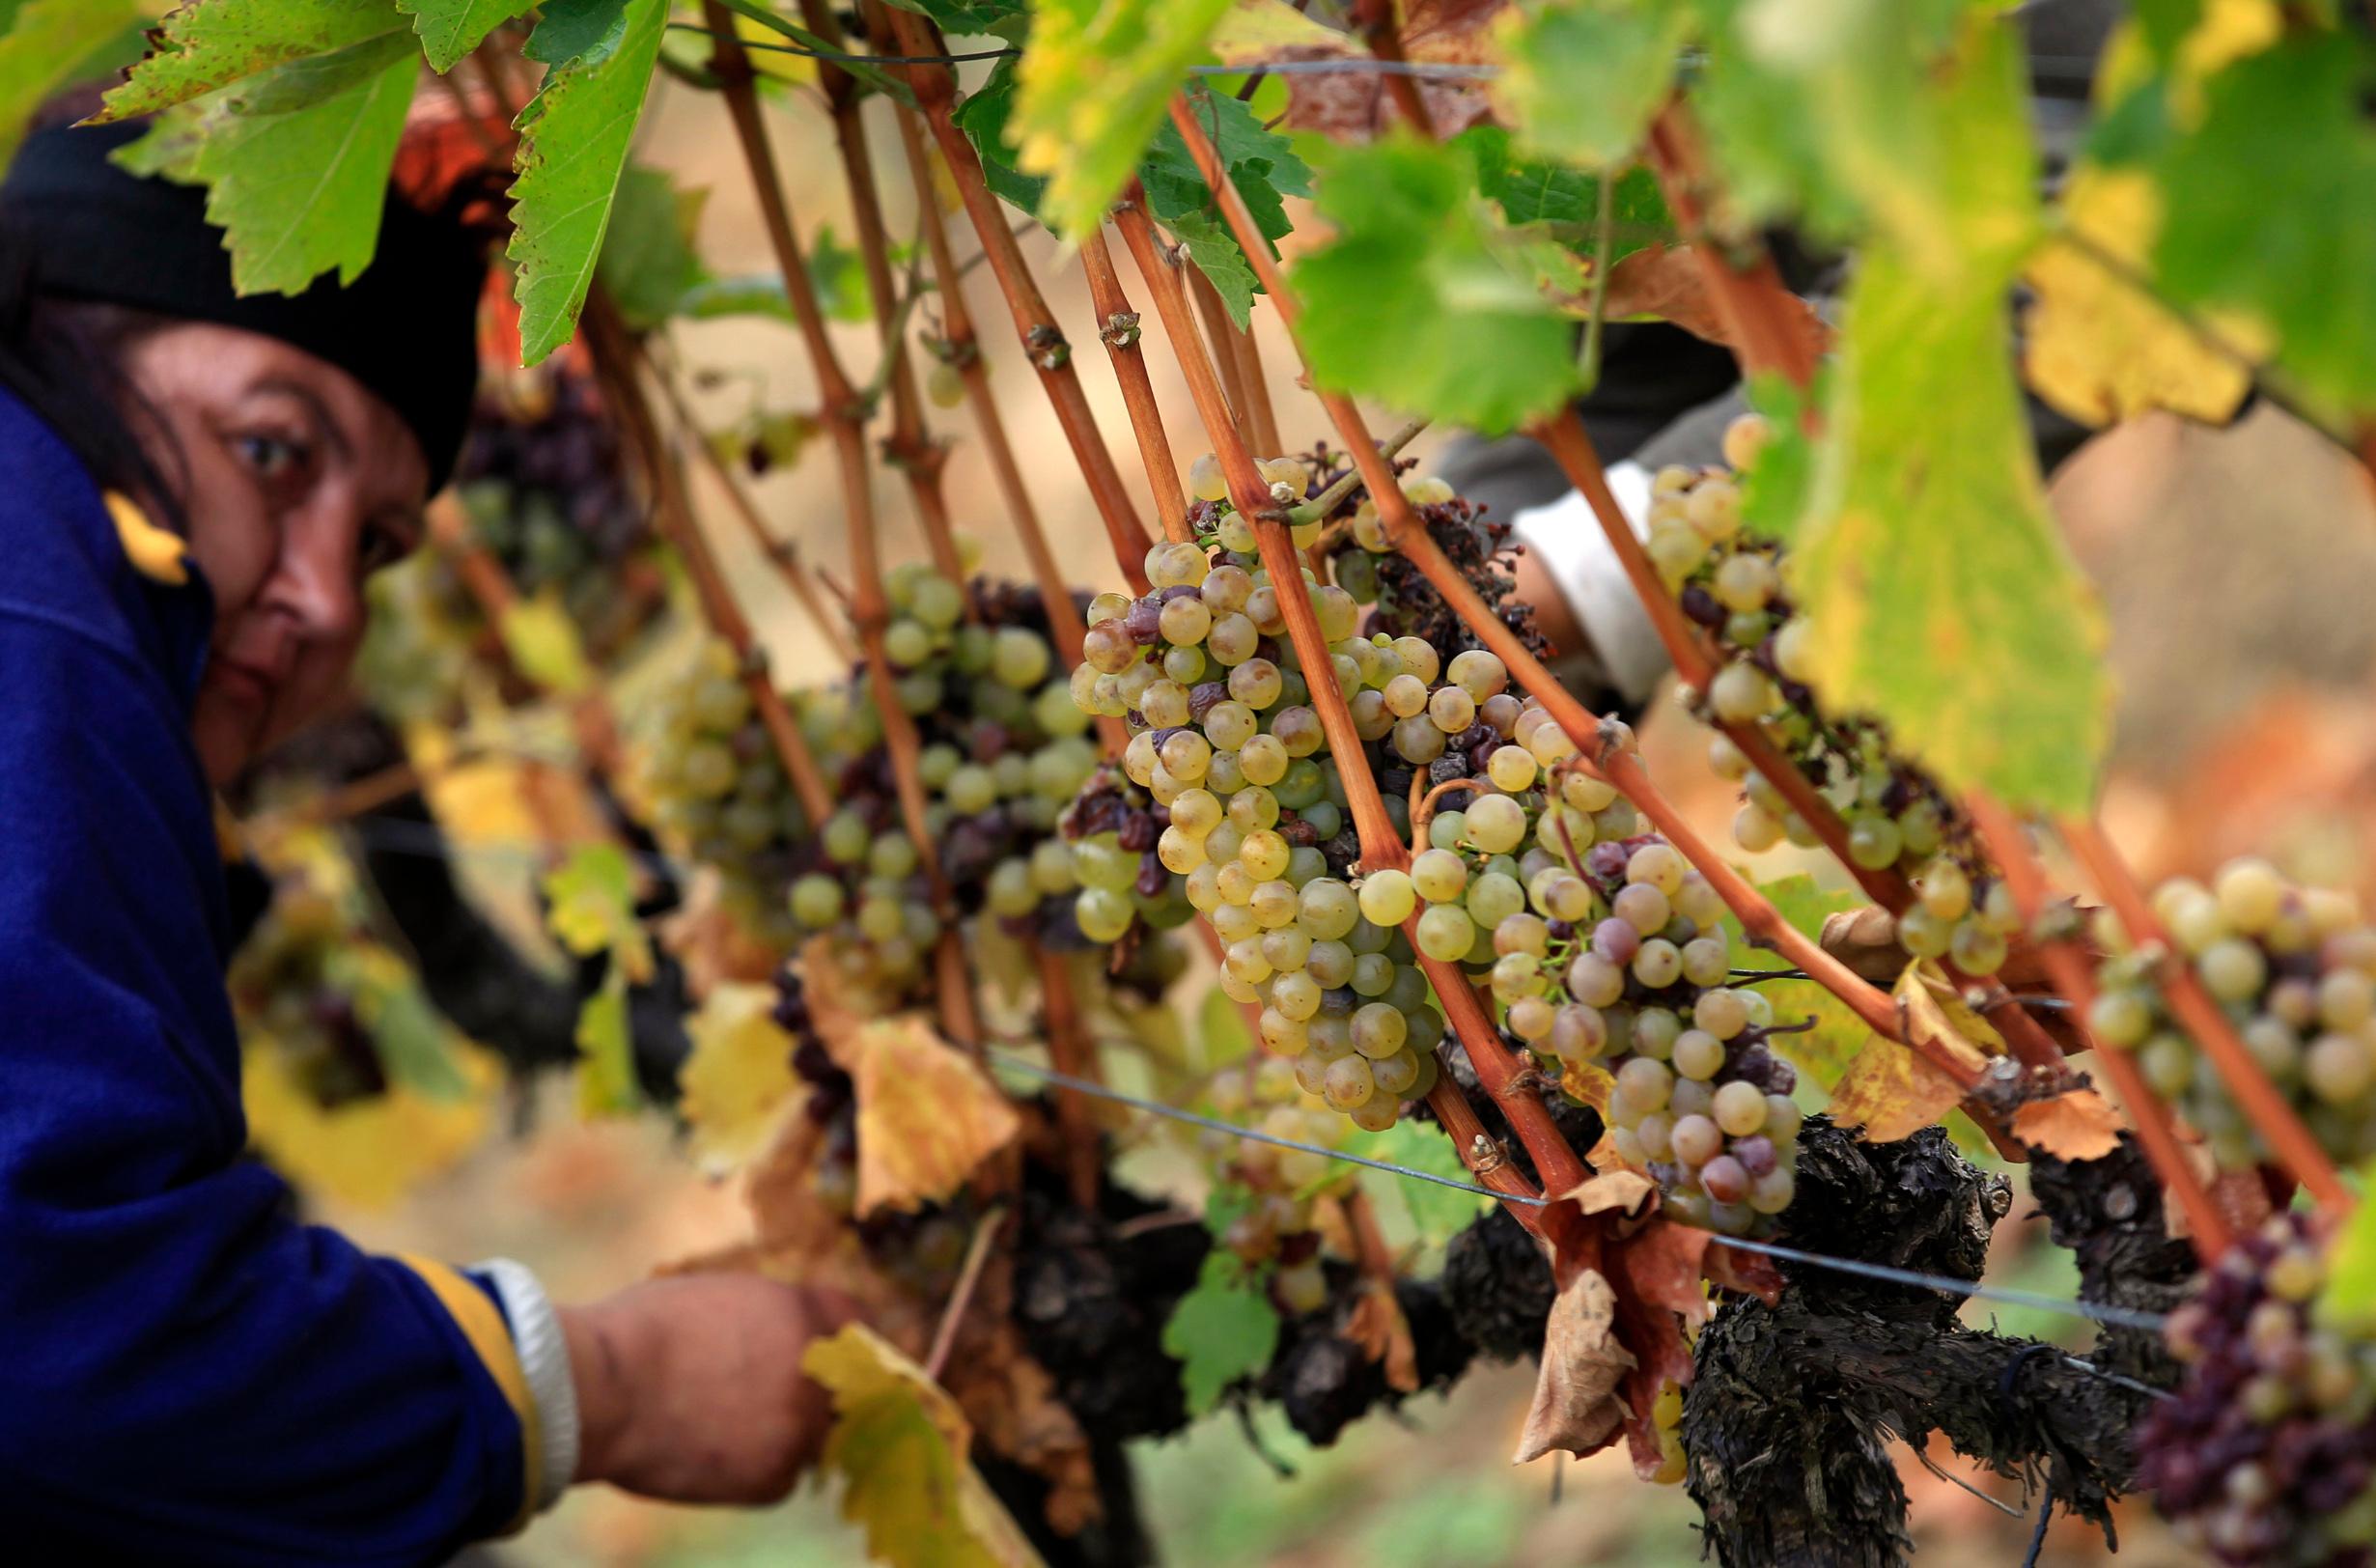 Radnici u vinogradu Tokaj u Mađarskoj